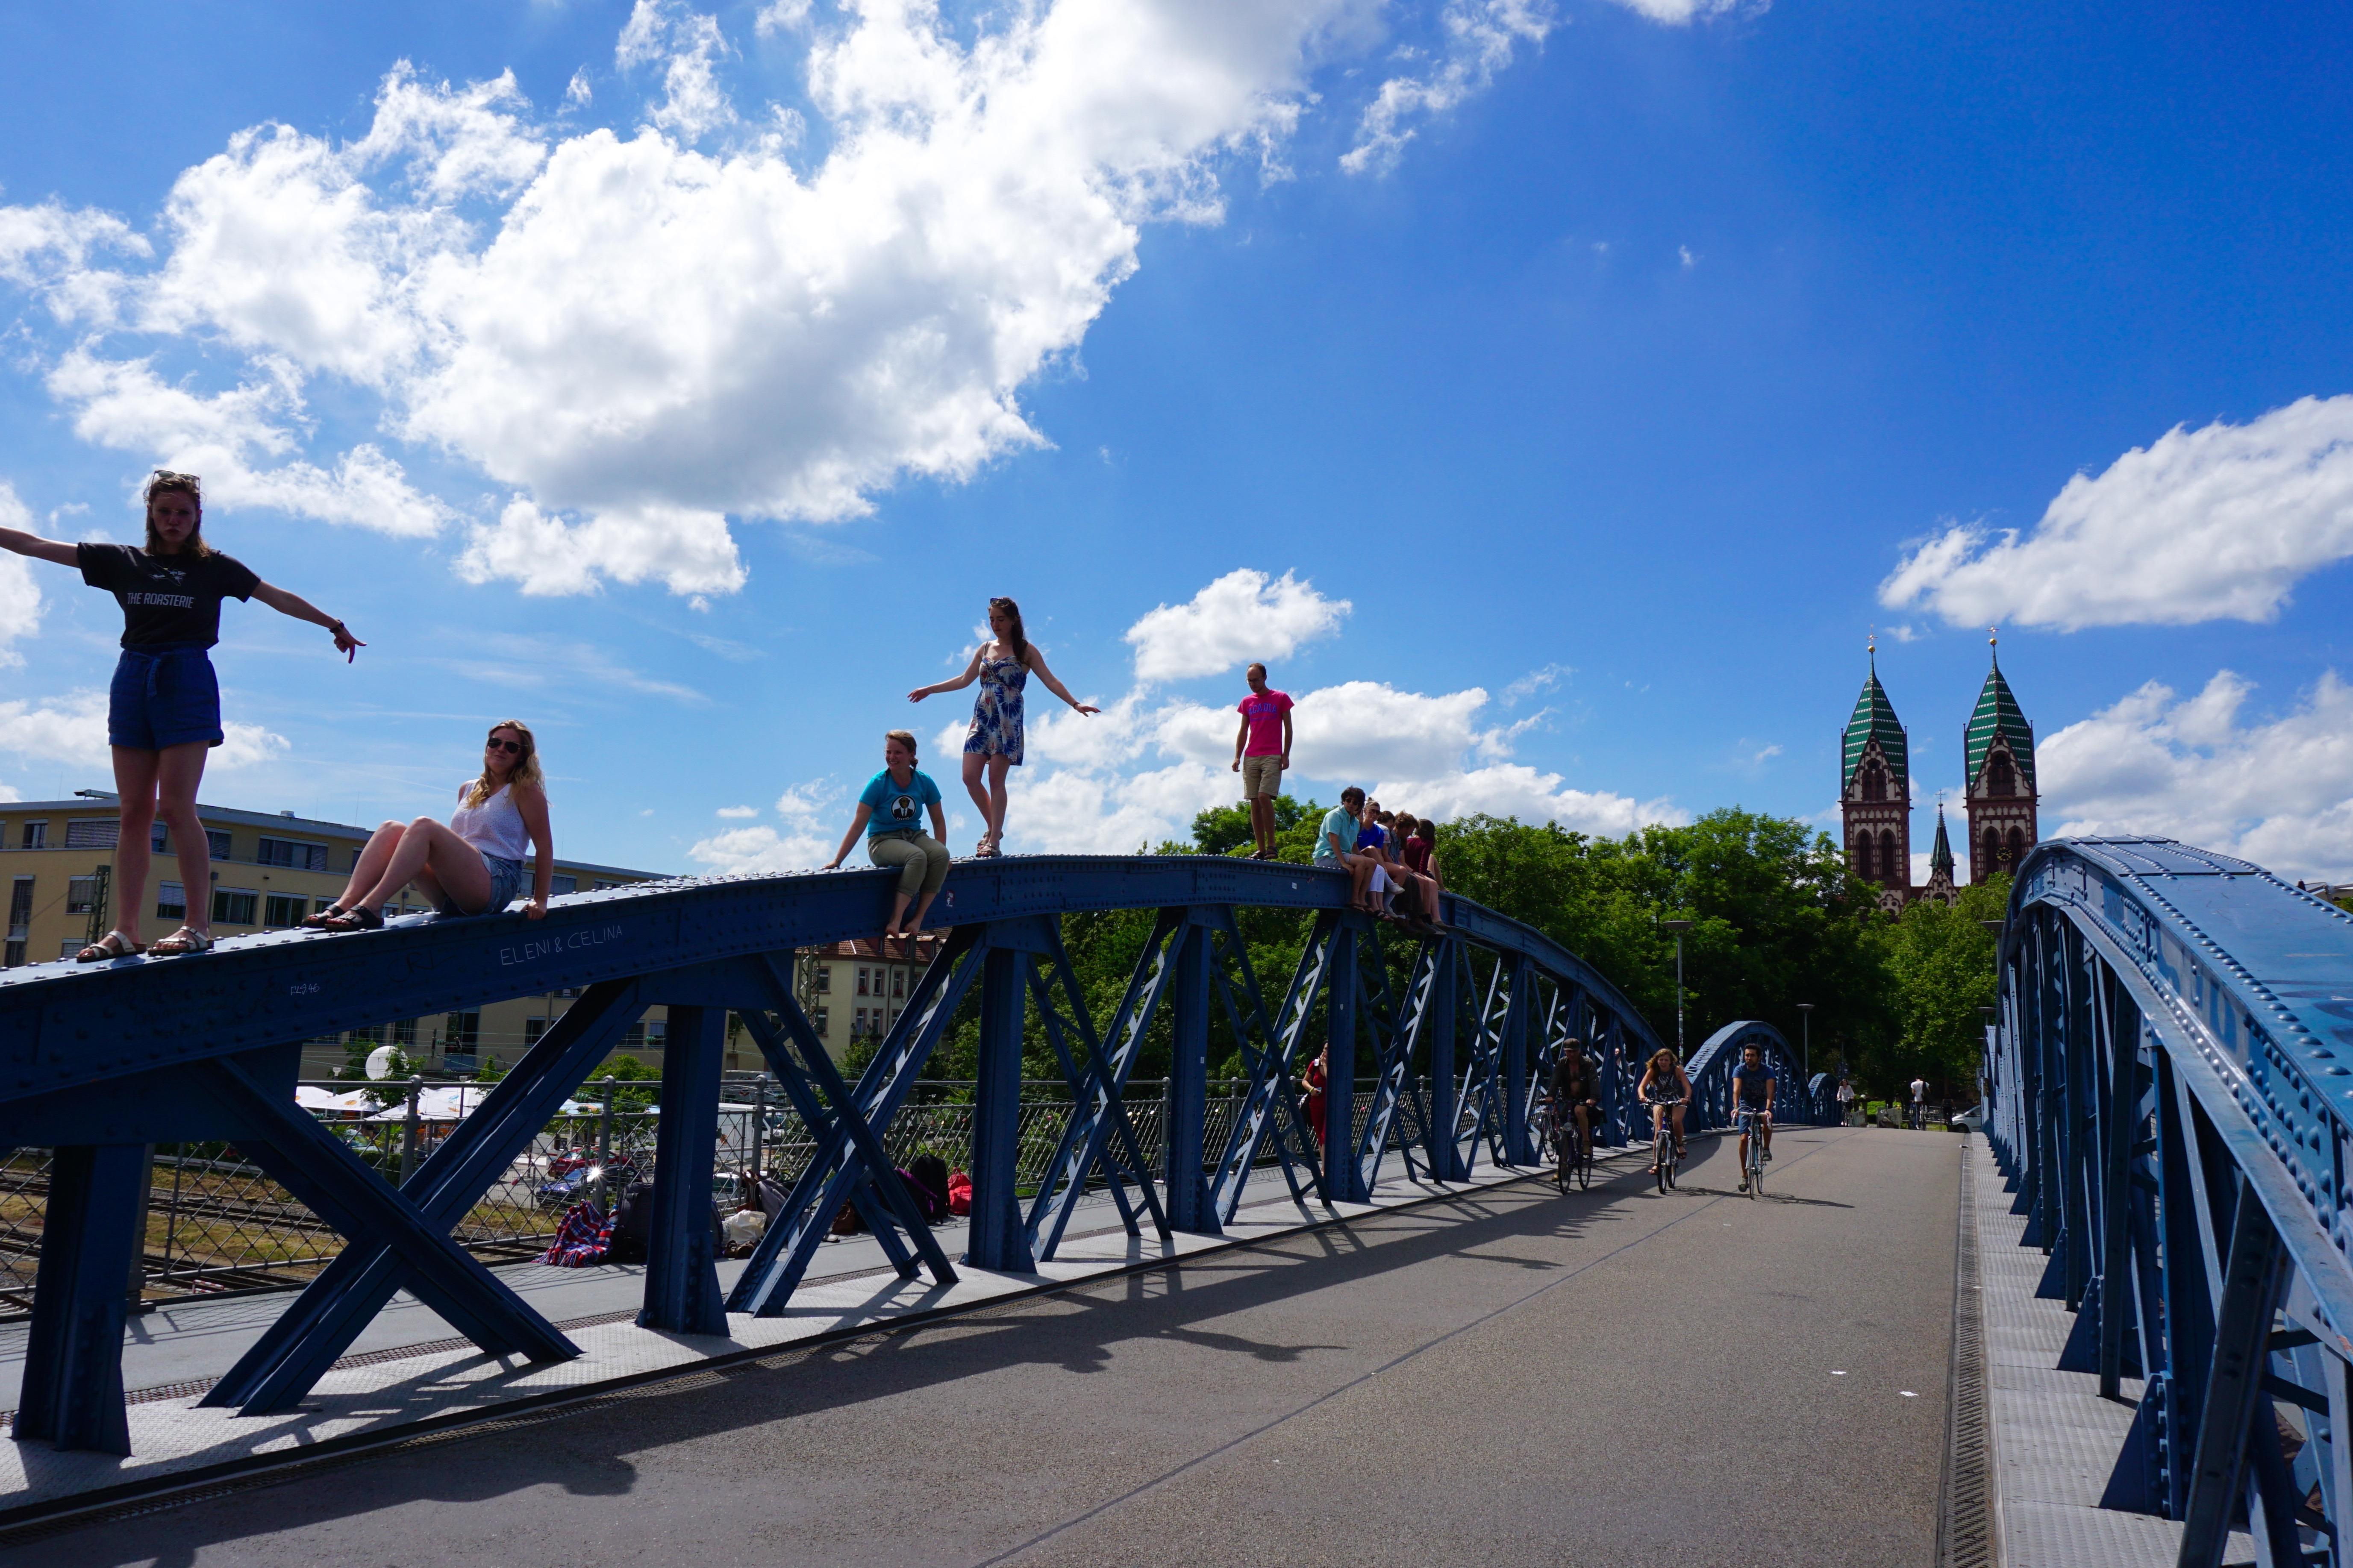 Sunny Dayon Blue Bridge, Freiburg by Sofia Deer